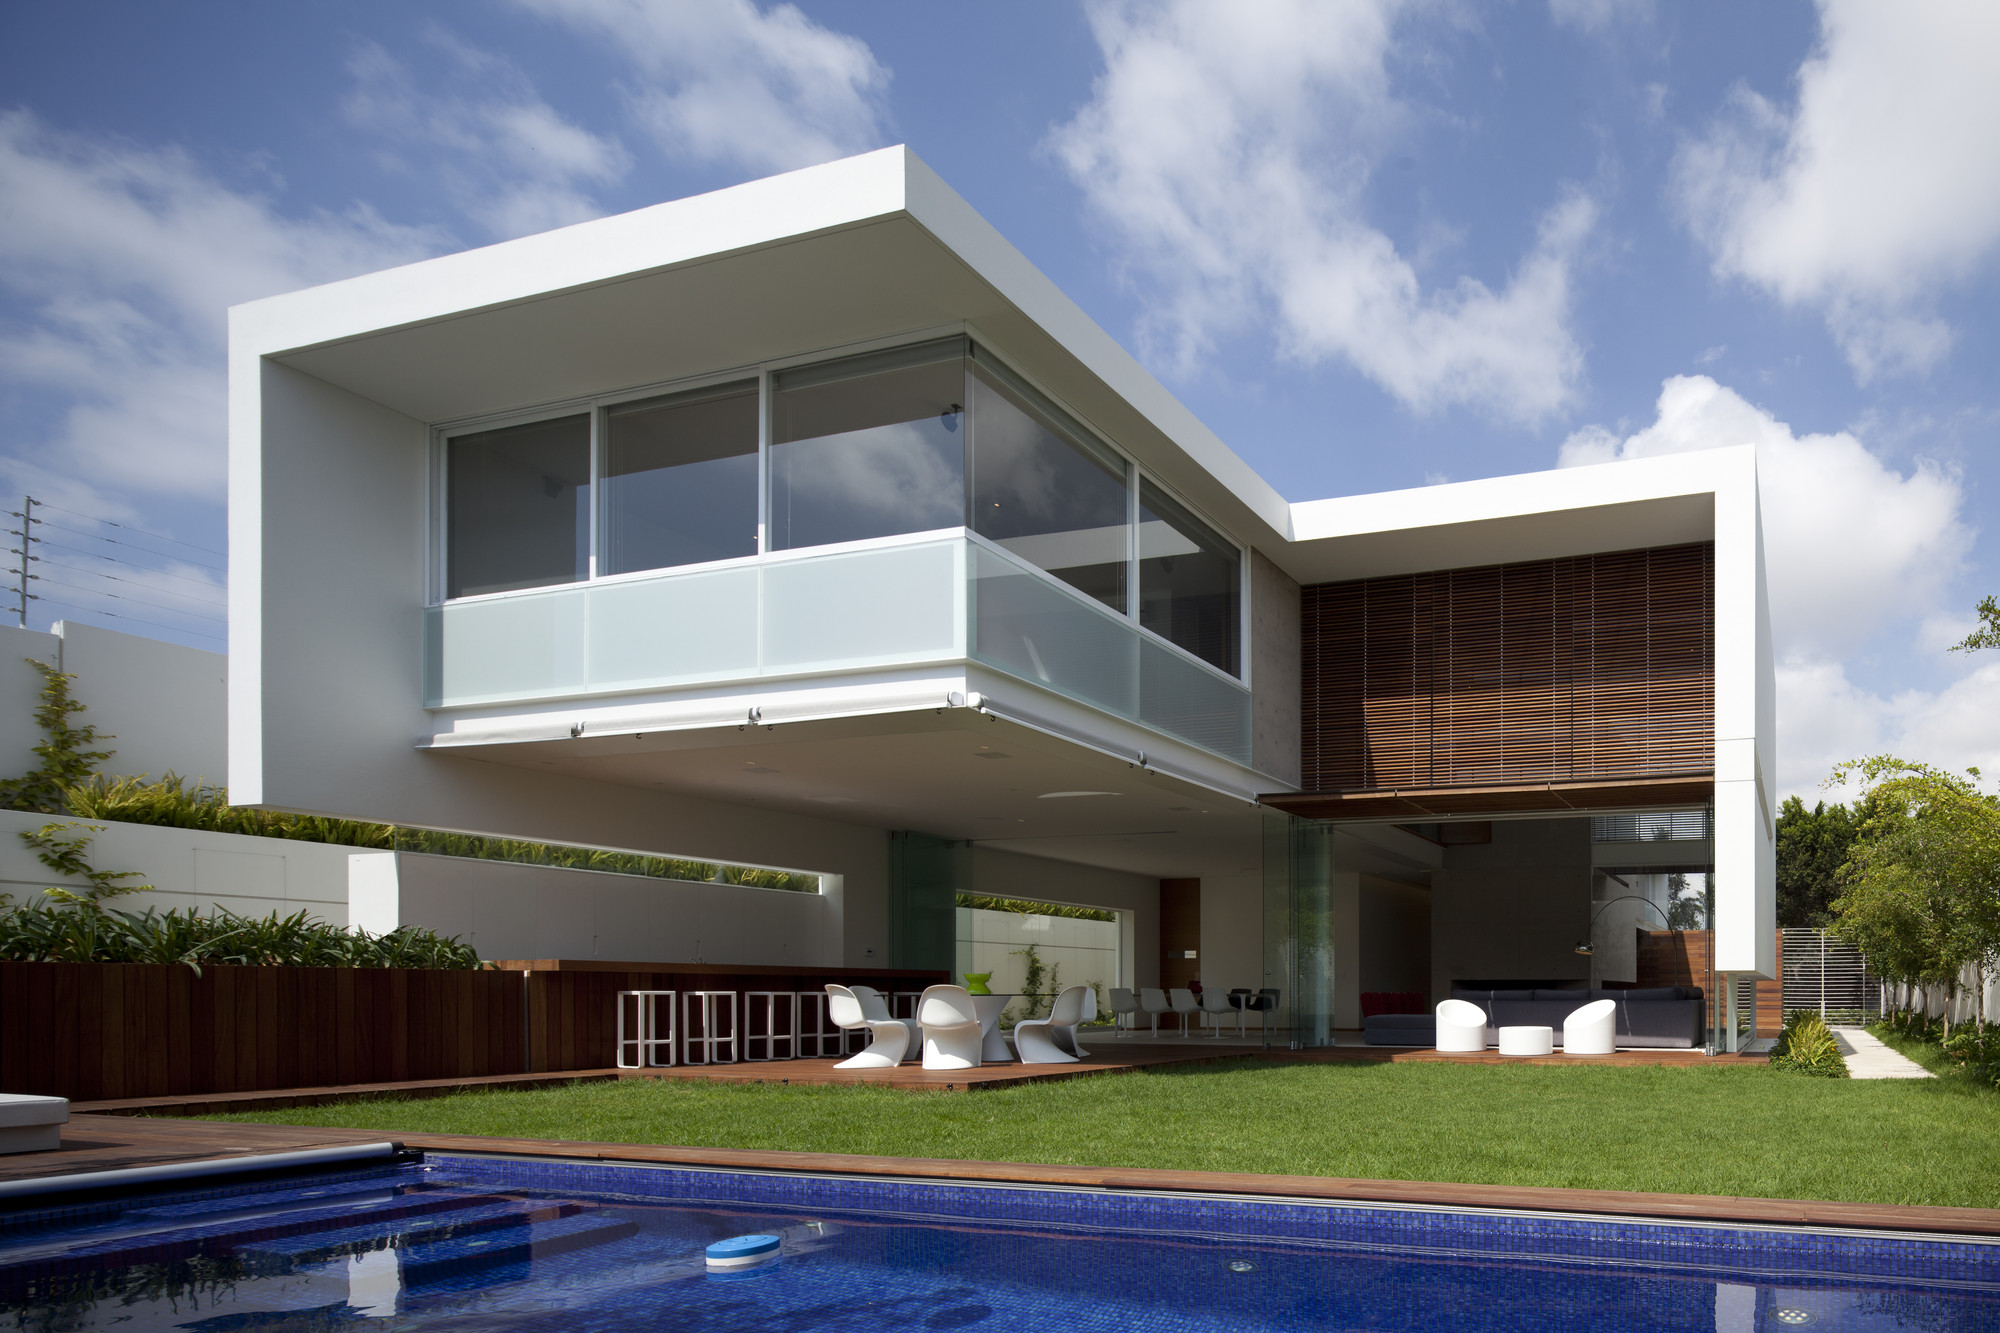 FF House / Hernandez Silva Arquitectos, © Carlos Díaz Corona